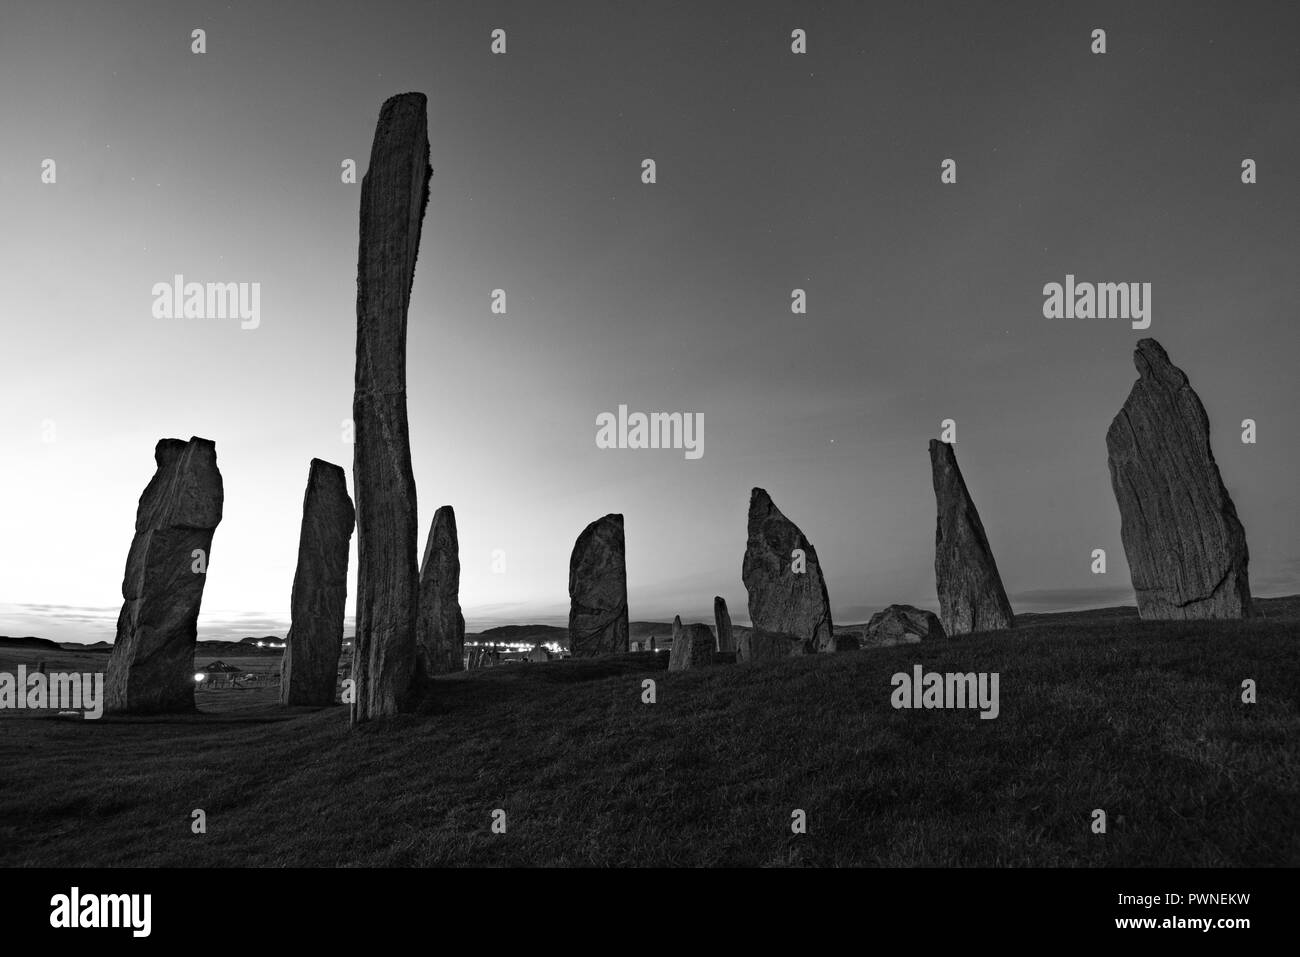 Stone Circle of Callanish at blue hour, isle of Lewis, Western Isles, Outer Hebrides, Scotland, UK - Stock Image